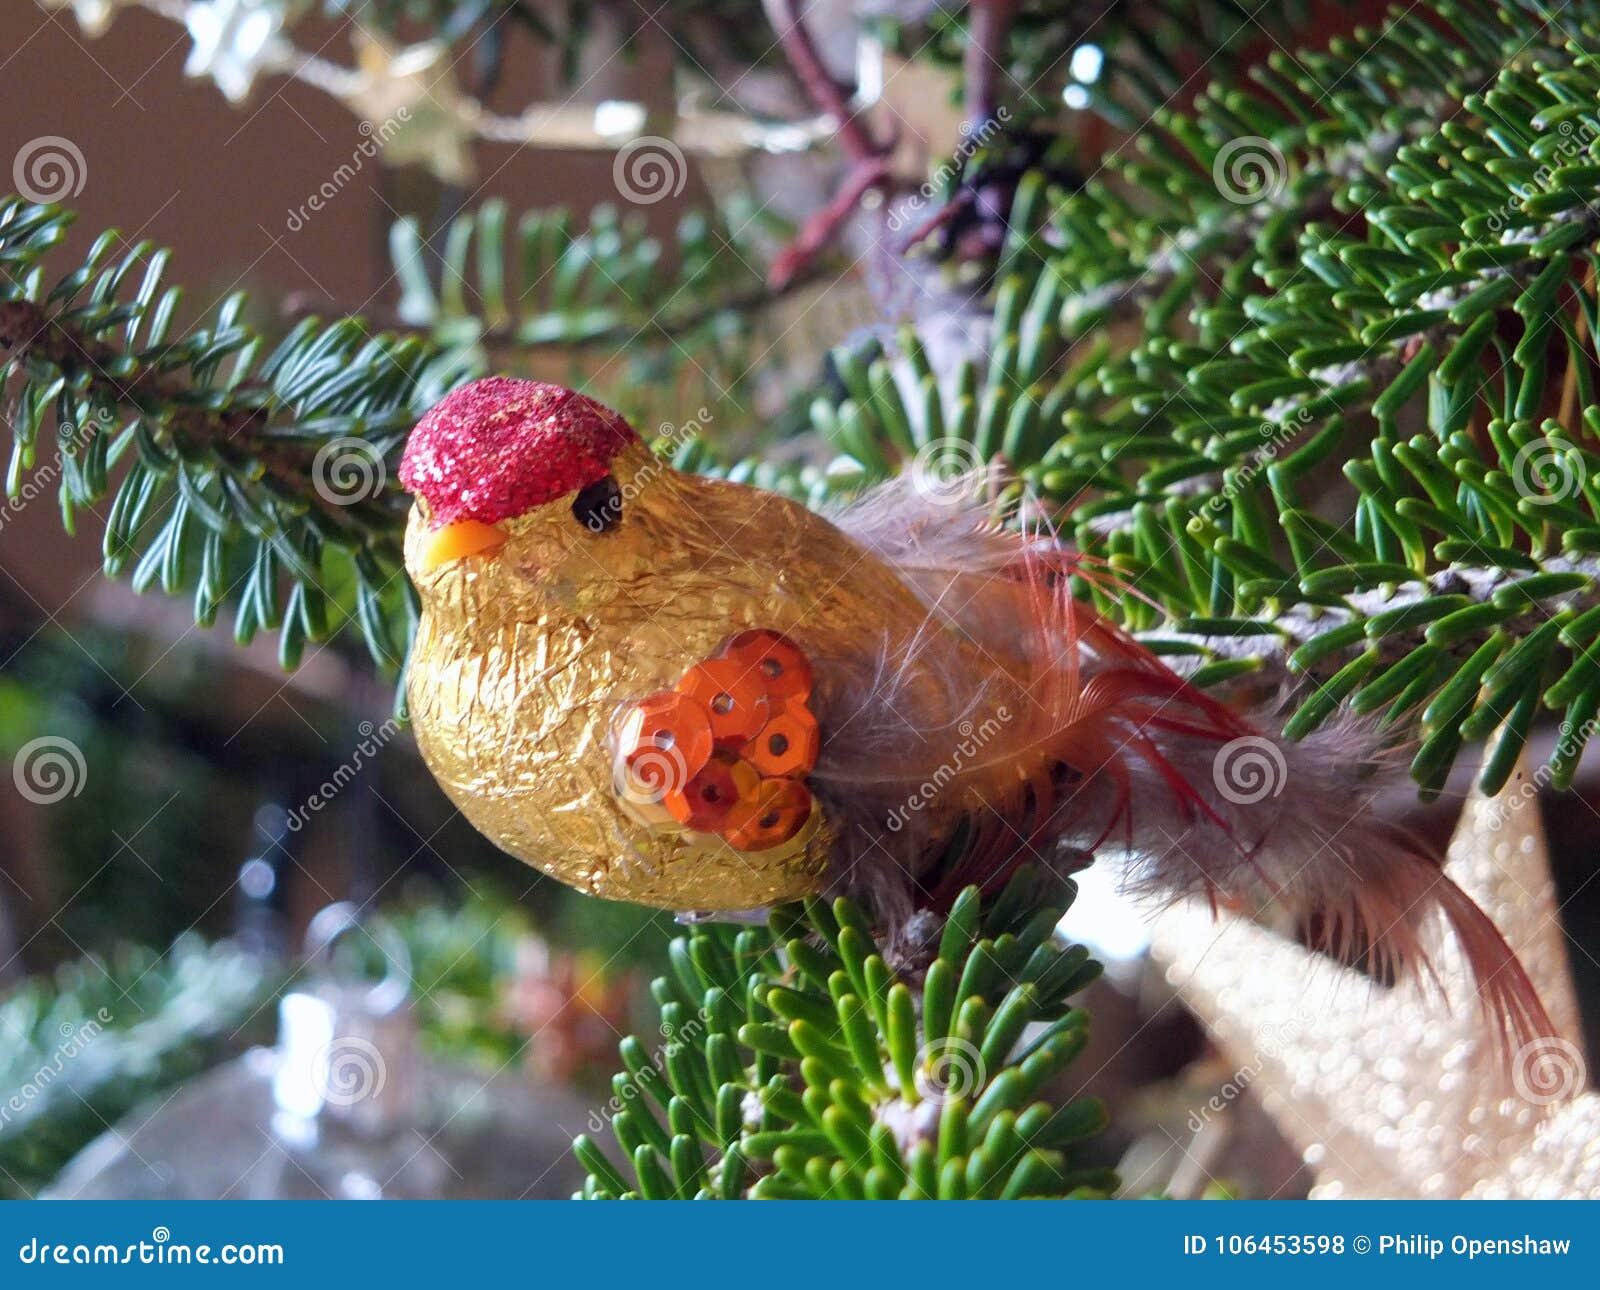 gold shiny bird christmas tree decoration on a pine branch